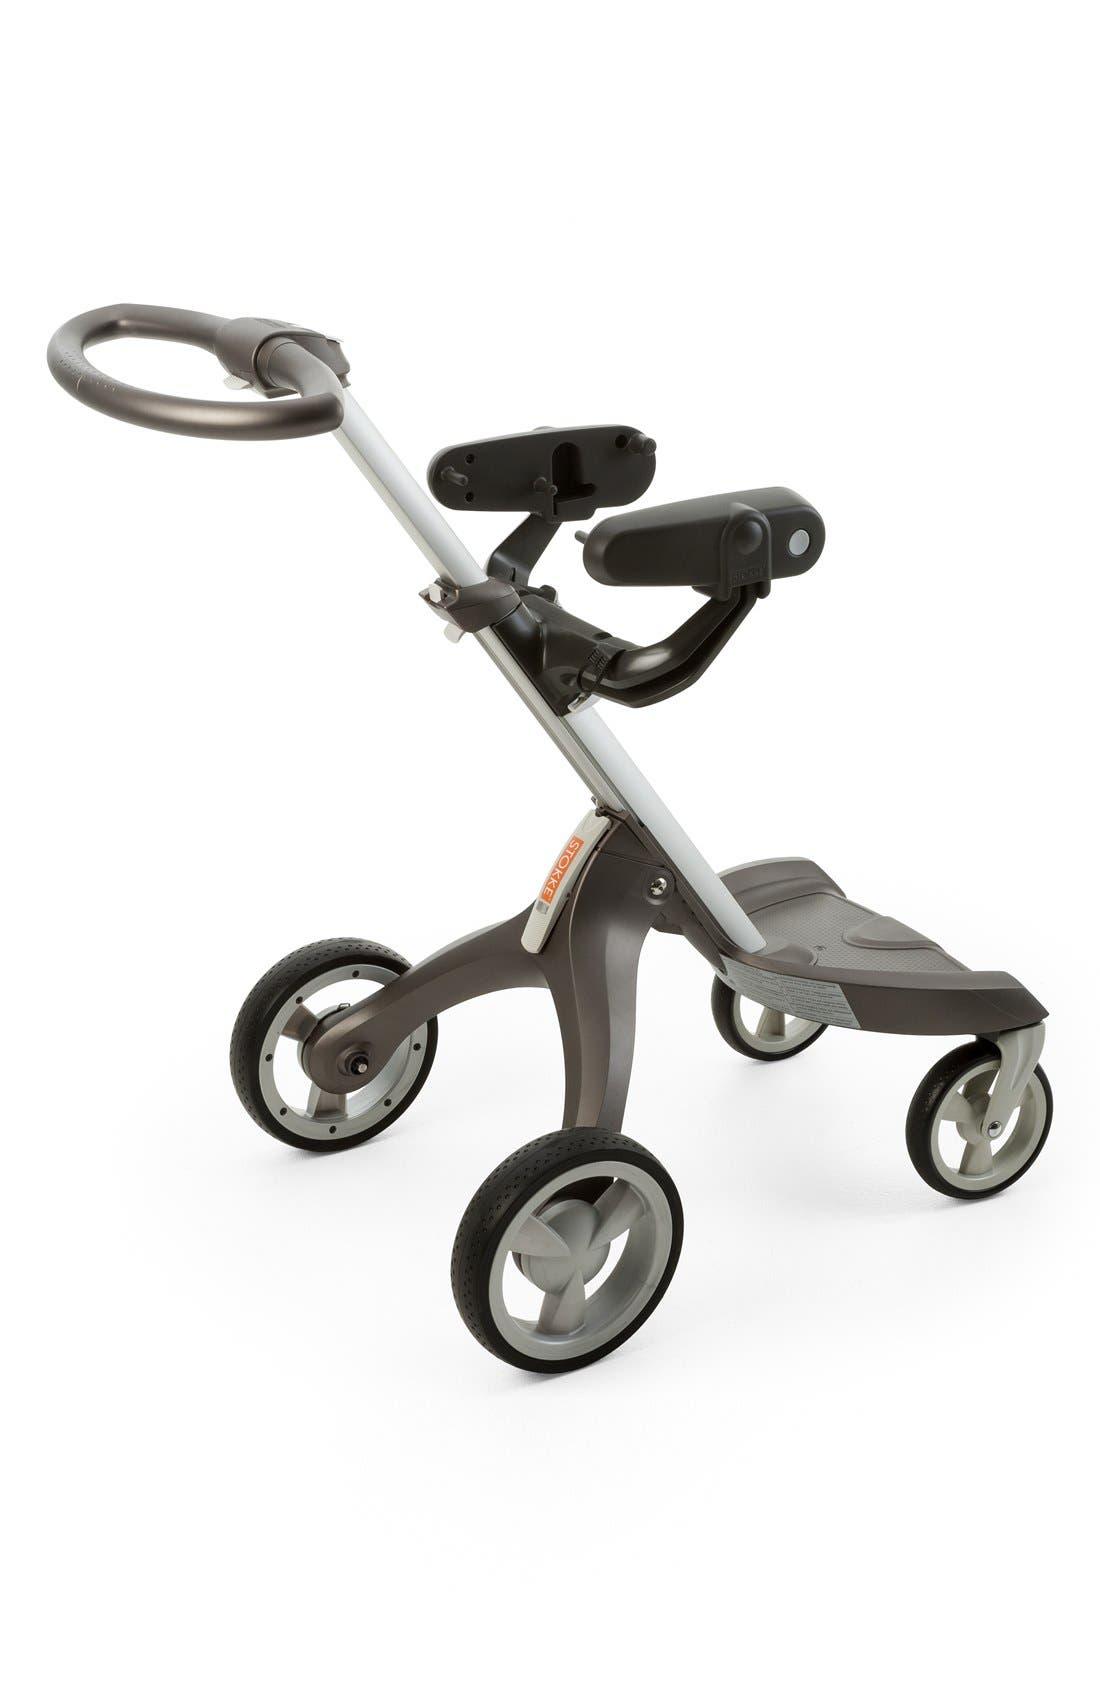 Peg Perego Car Seat Adaptor for Stokke Strollers,                             Alternate thumbnail 2, color,                             Dark Grey